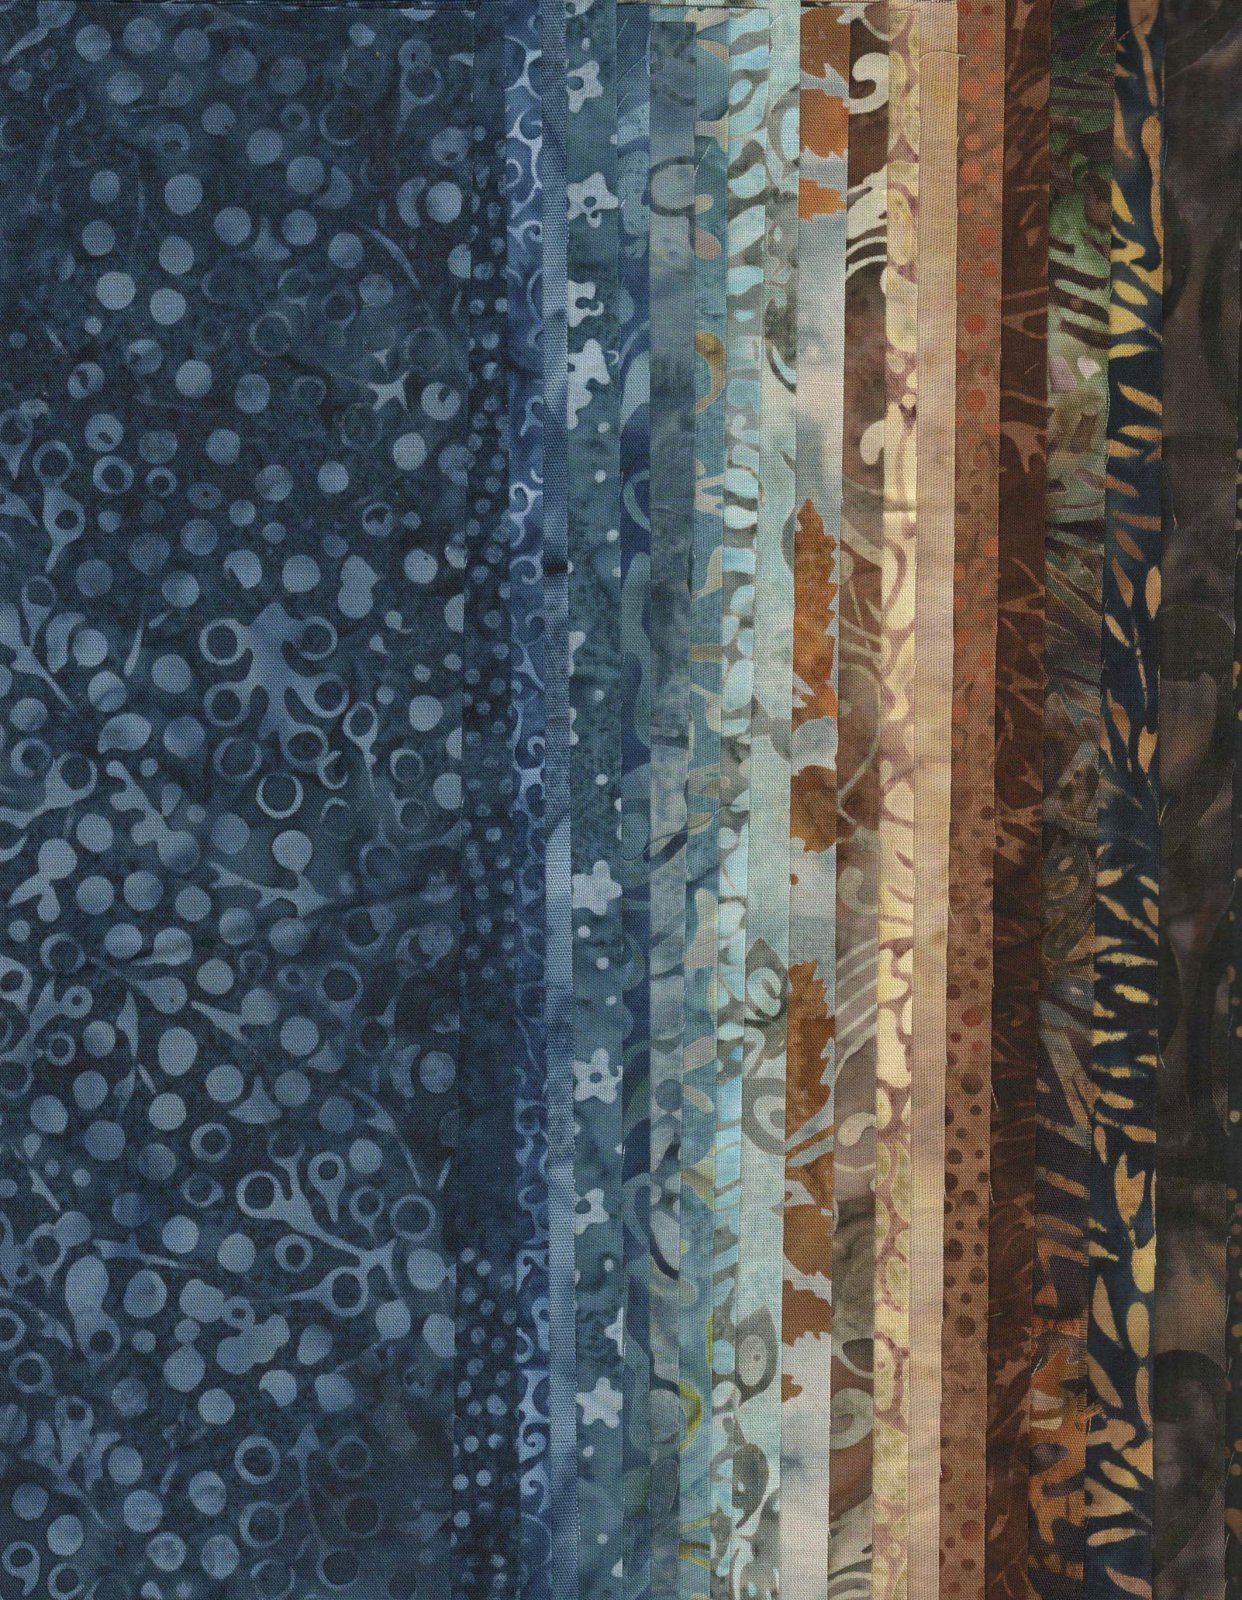 Hoffman Bali Batiks  - 20 cuts of 10 squares - Blue &  Brown Batiks